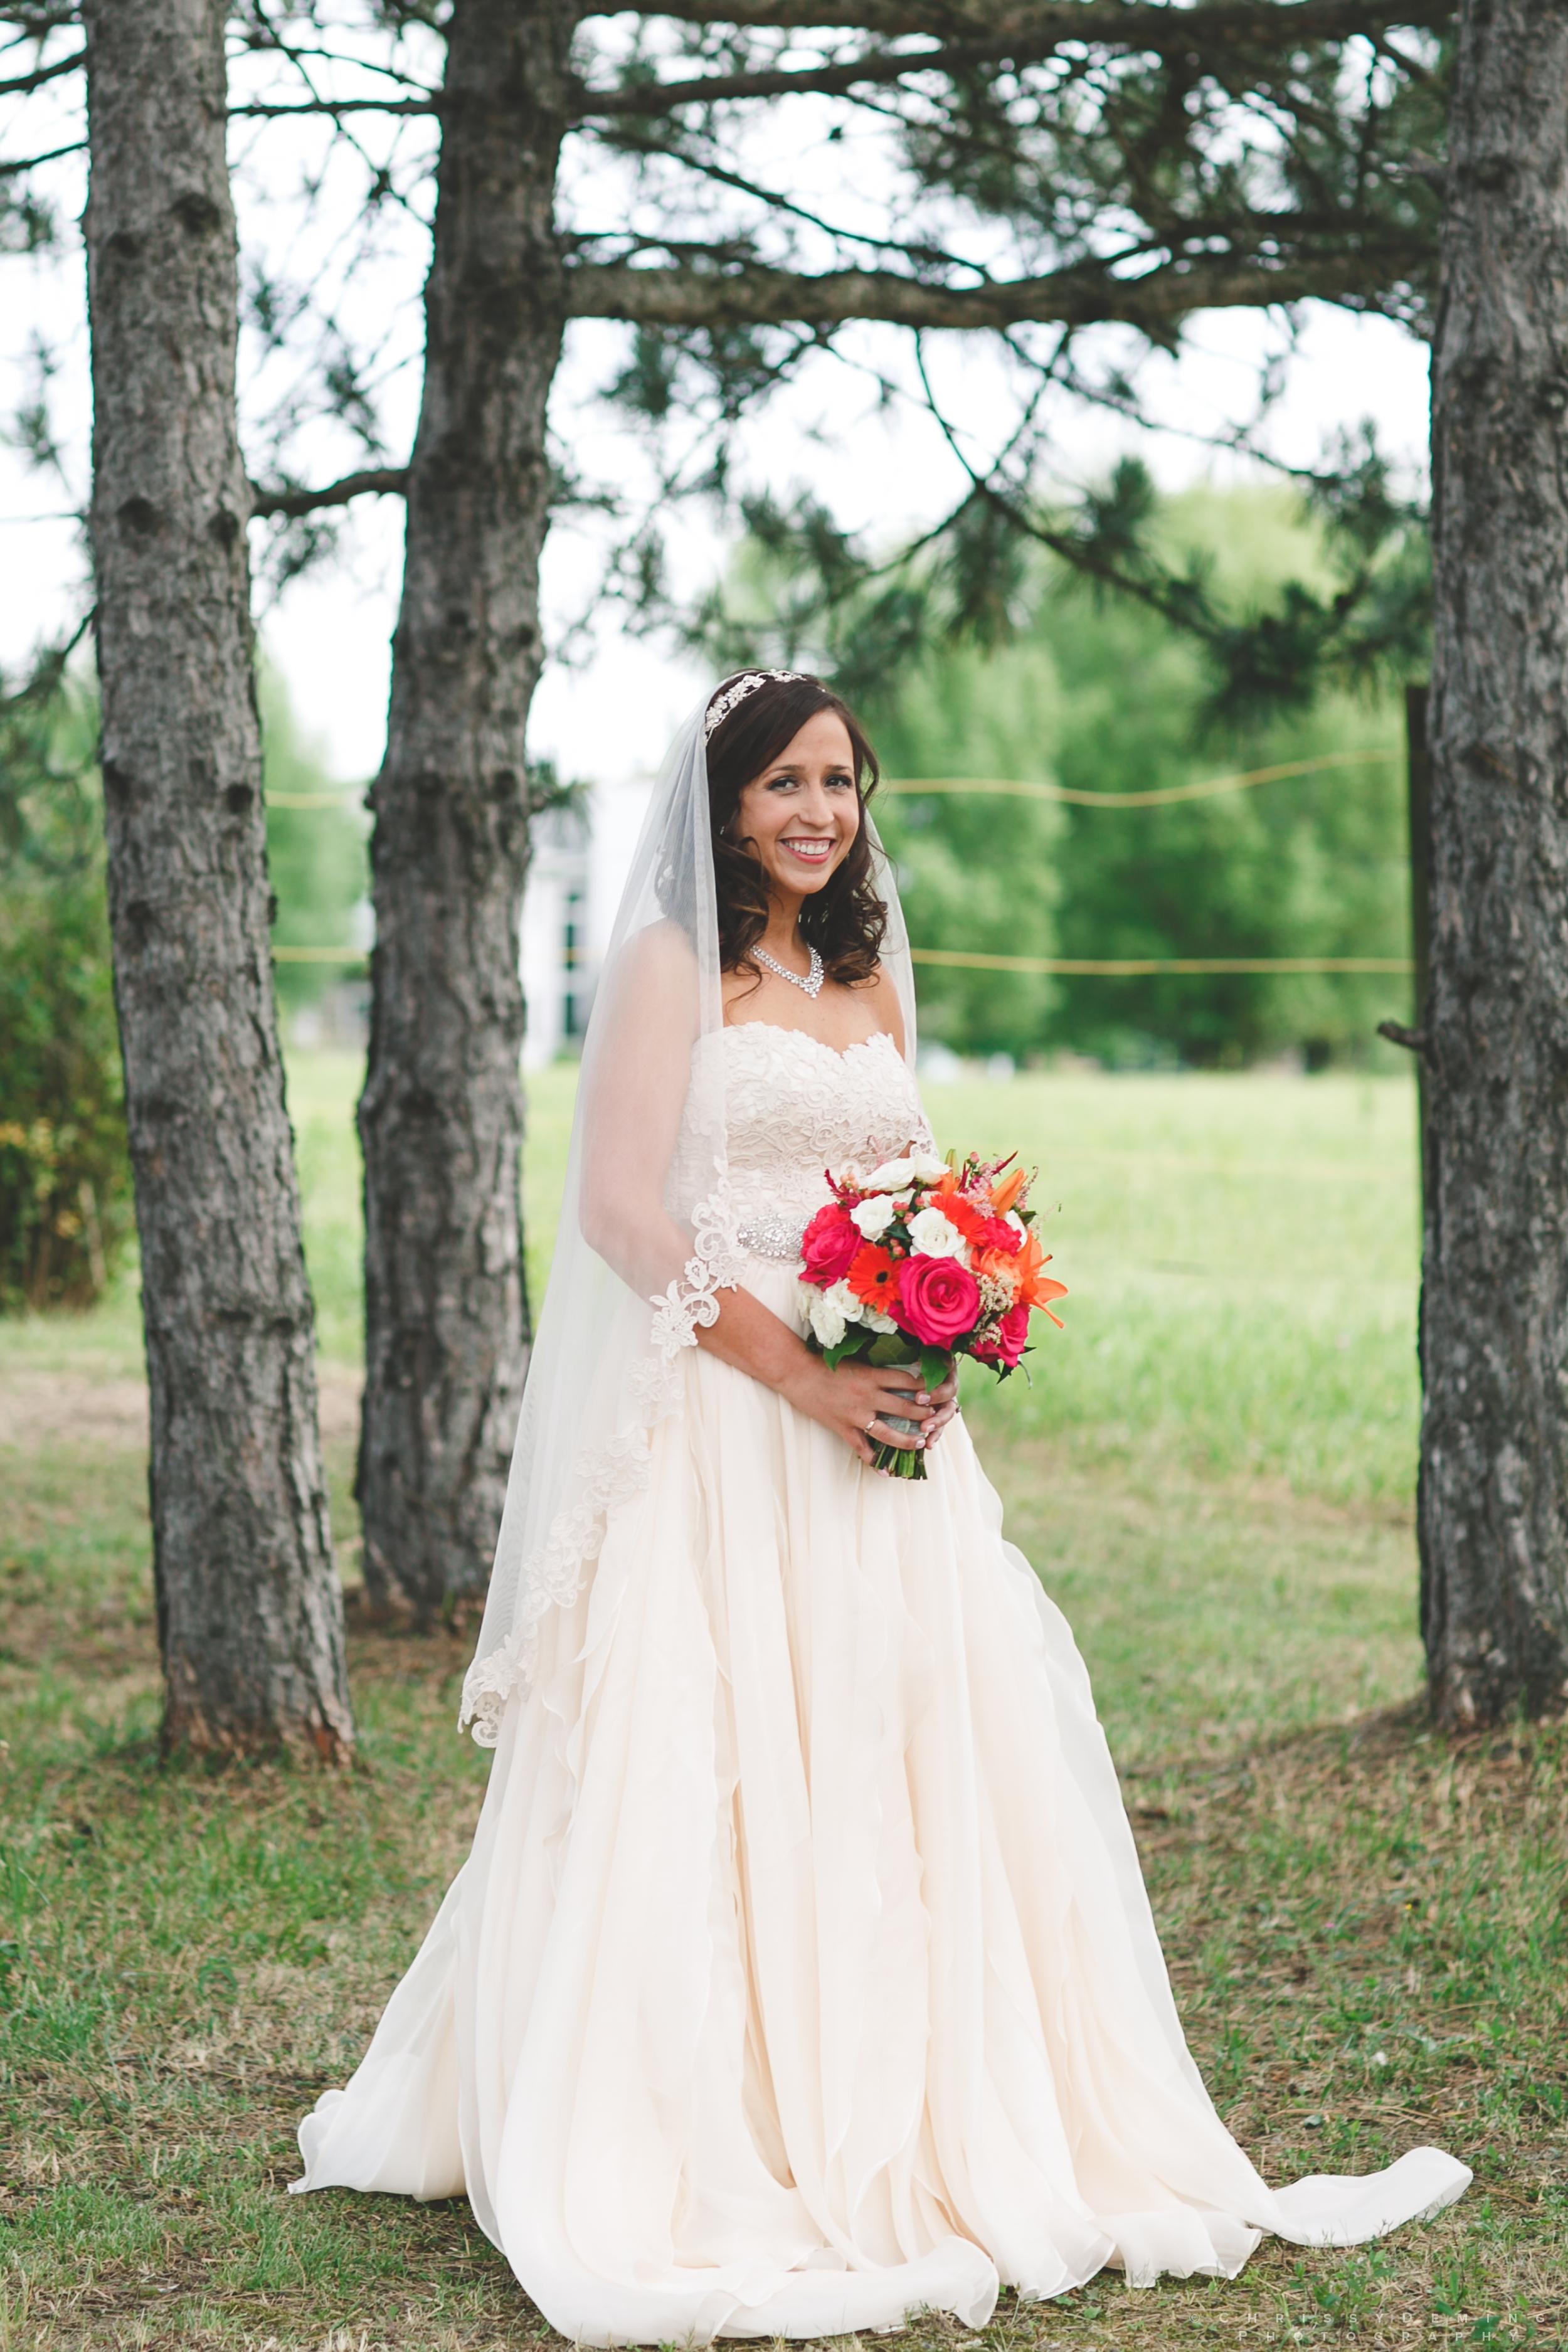 crete_IL_farm_wedding_photographer_0011.jpg